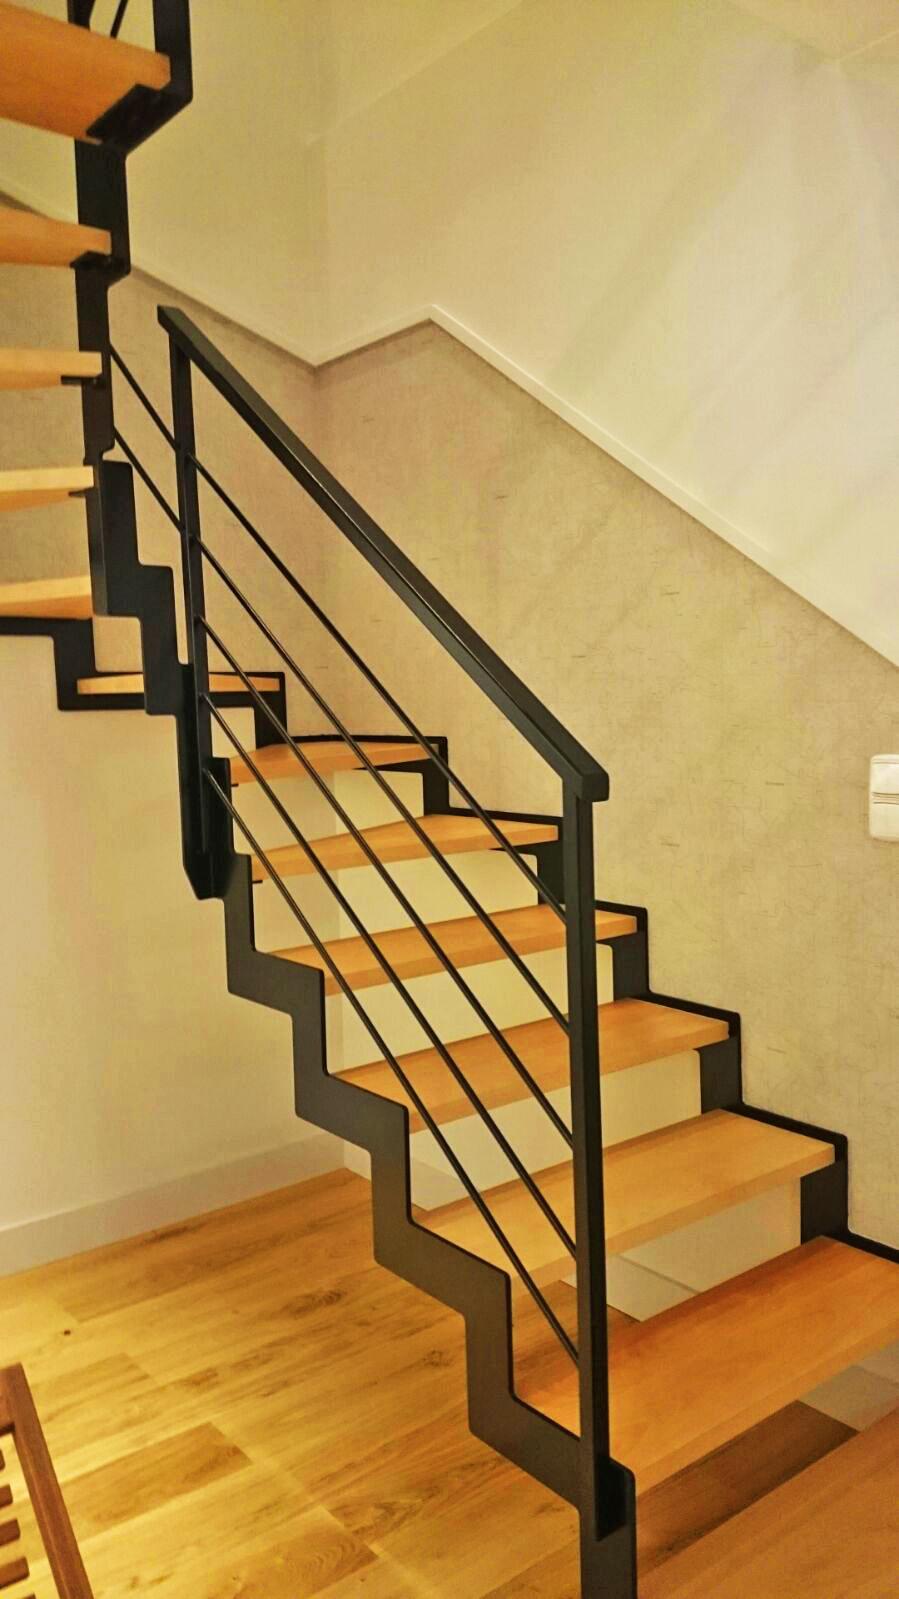 Escalera compensada en donostia san sebasti n con for Escaleras de interior precios